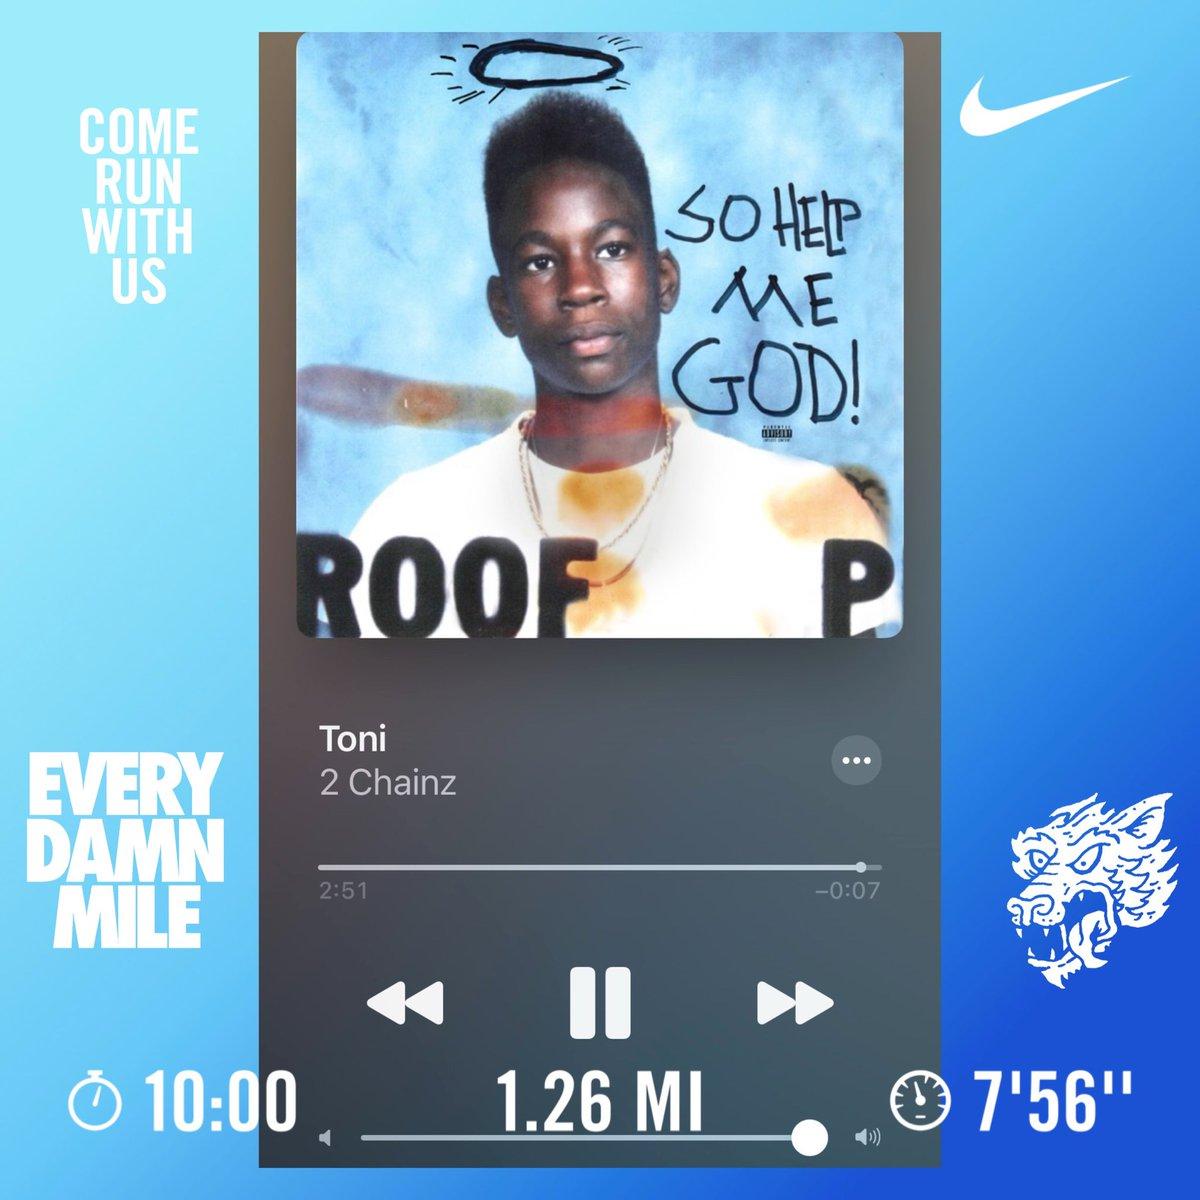 260 Straight Weeks #gymlife #gymrat #gymflow #chest #arms #abs #fitness #finishstrong #DjRaQuest #DjLife #Nikerunning #hustlehart #nike #nikerunning #FitDjs #MambaMentality